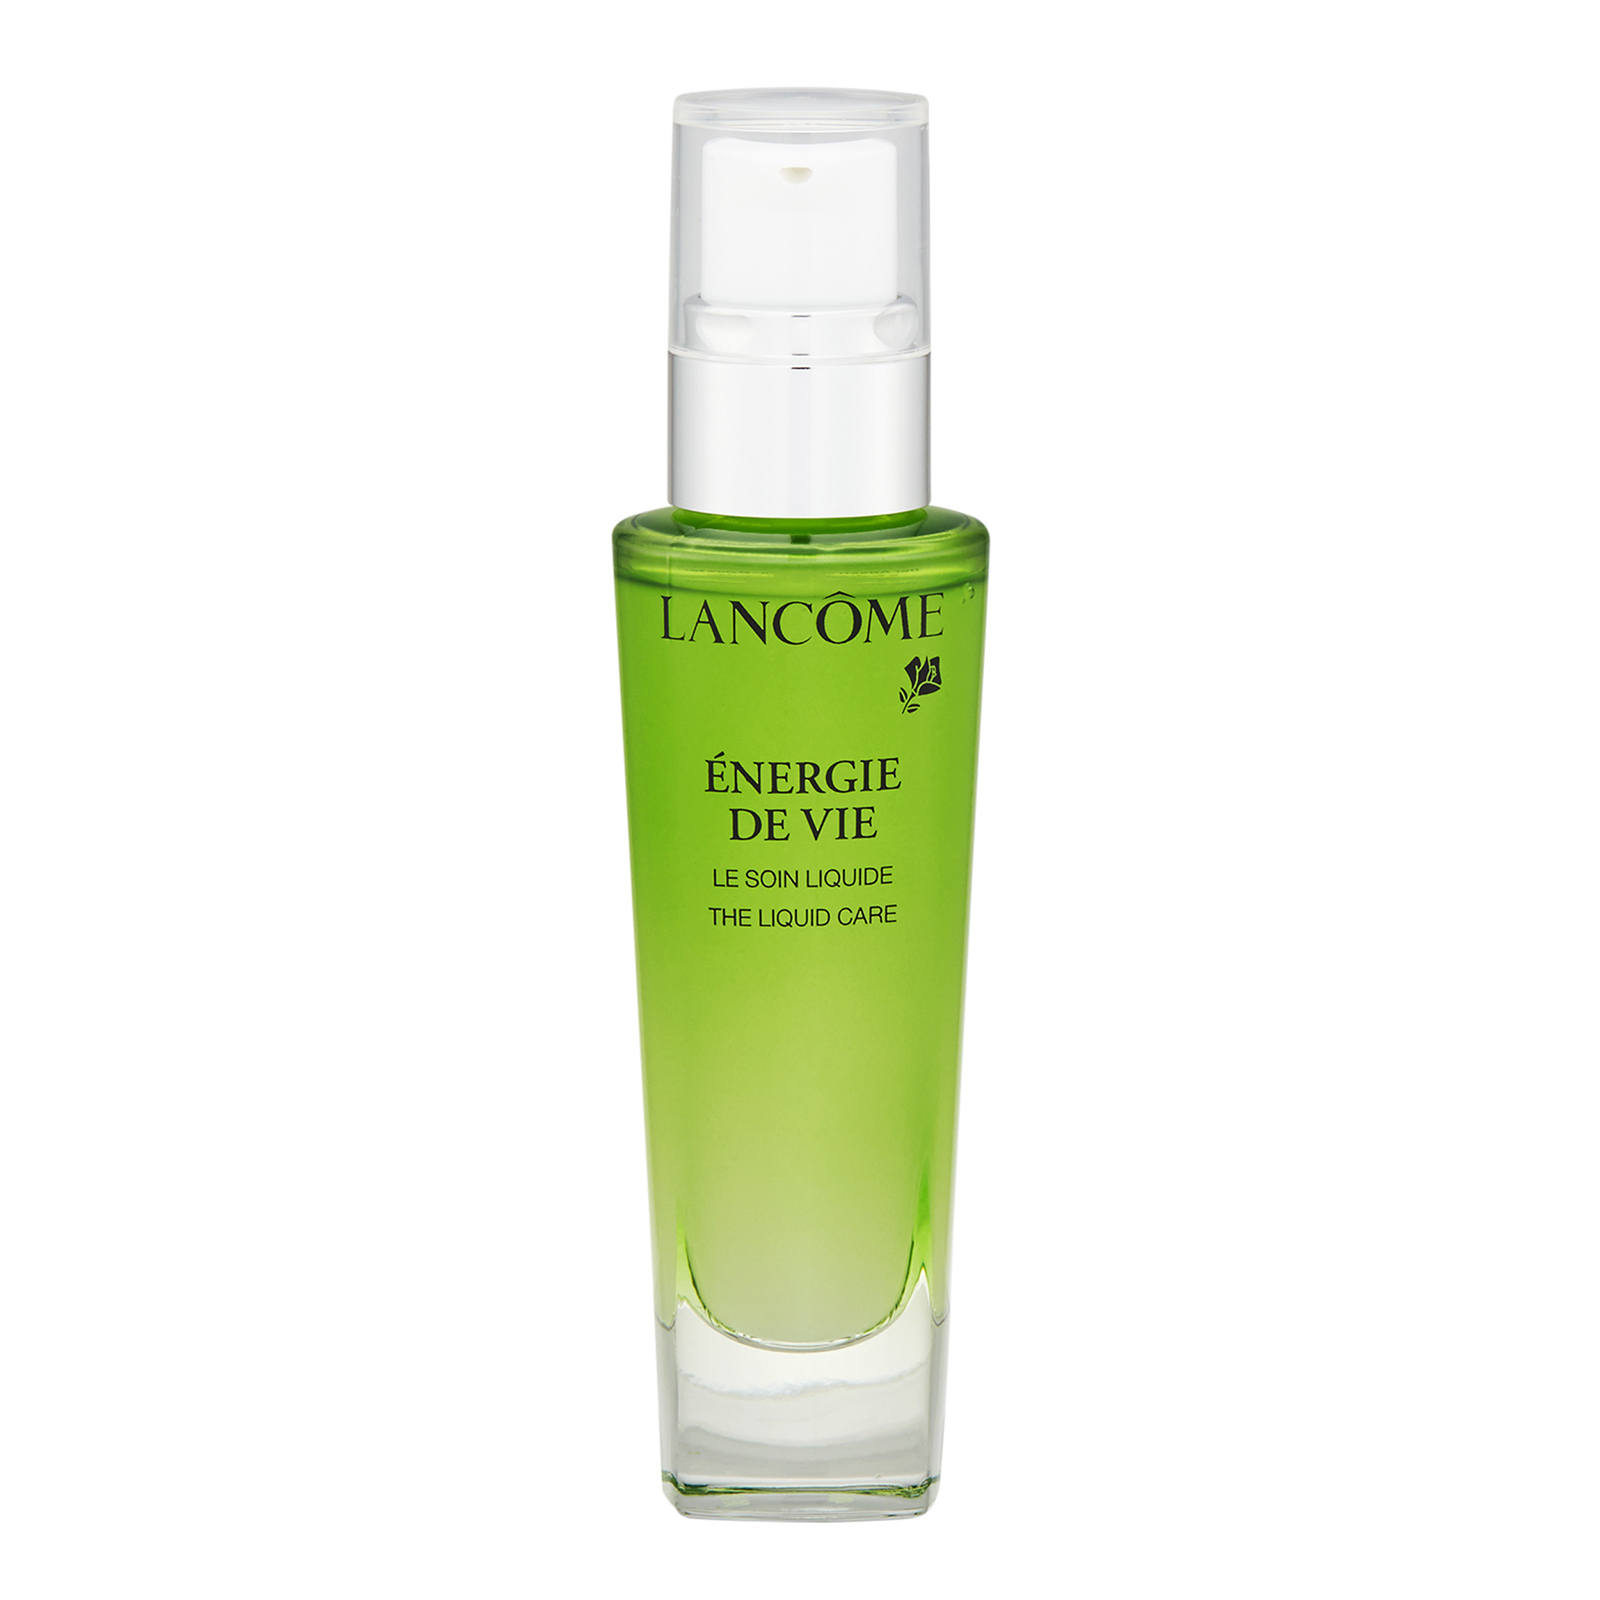 LANCÔME Energie De Vie  The Smoothing & Glow Boosting Liquid Care 1oz, 30ml